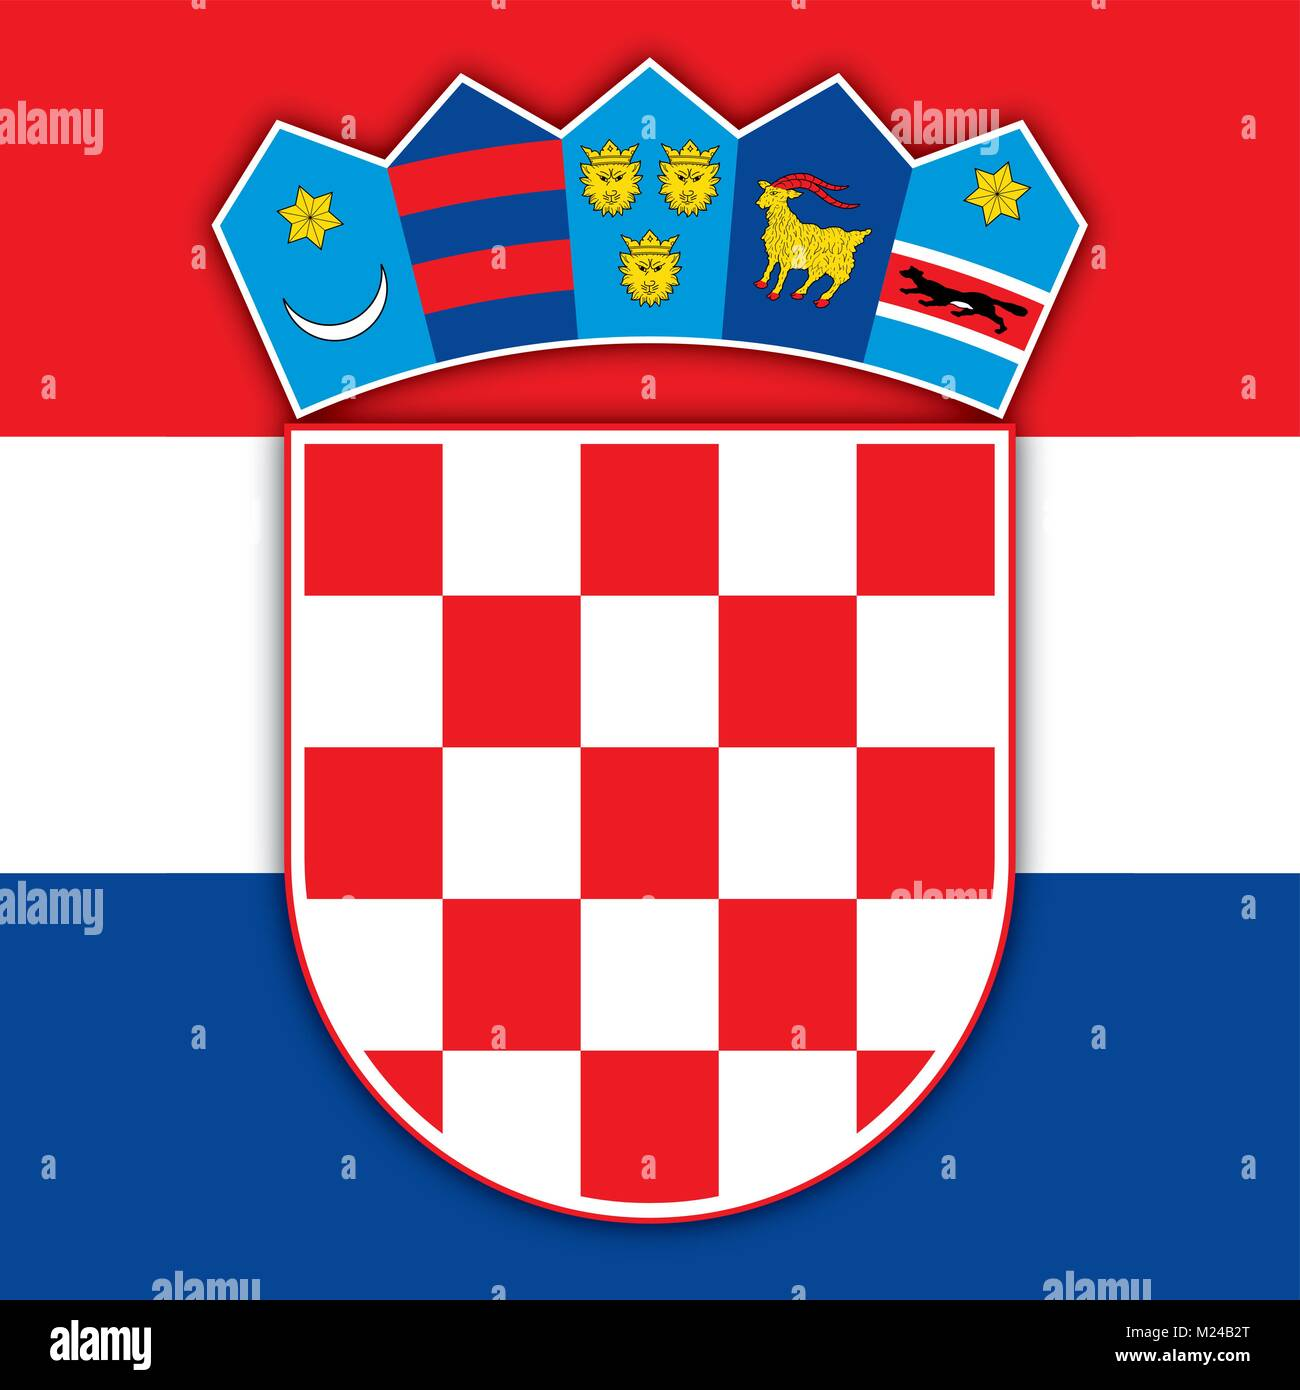 Croatia coat of arms and flag official symbols of the nation stock croatia coat of arms and flag official symbols of the nation biocorpaavc Images